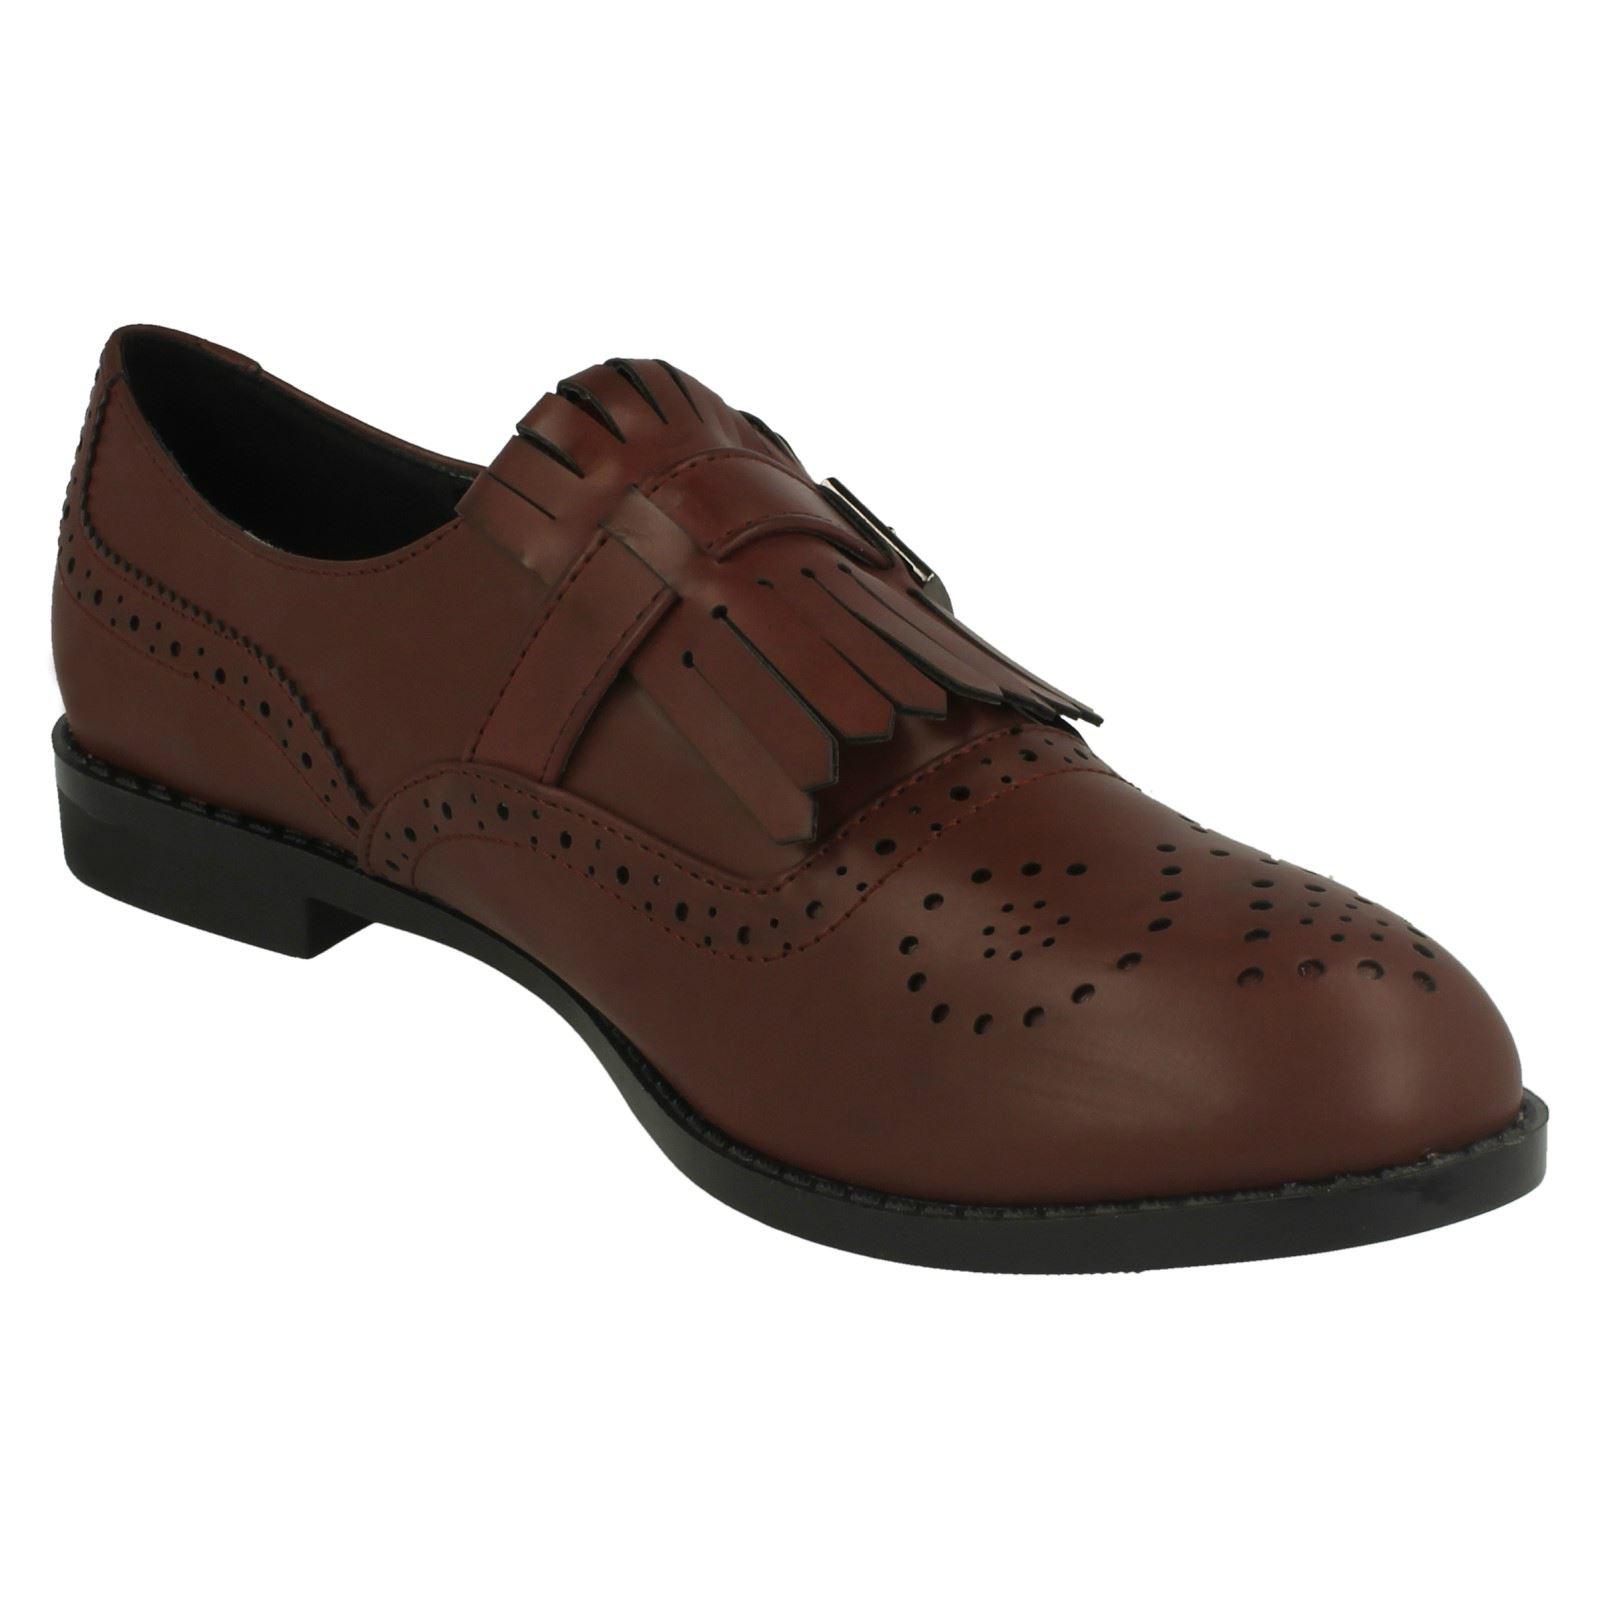 On Detalles Cordones Estilo De Zapato Mujer Sin 'zapatos' Spot Oxford 3ARq4jLSc5